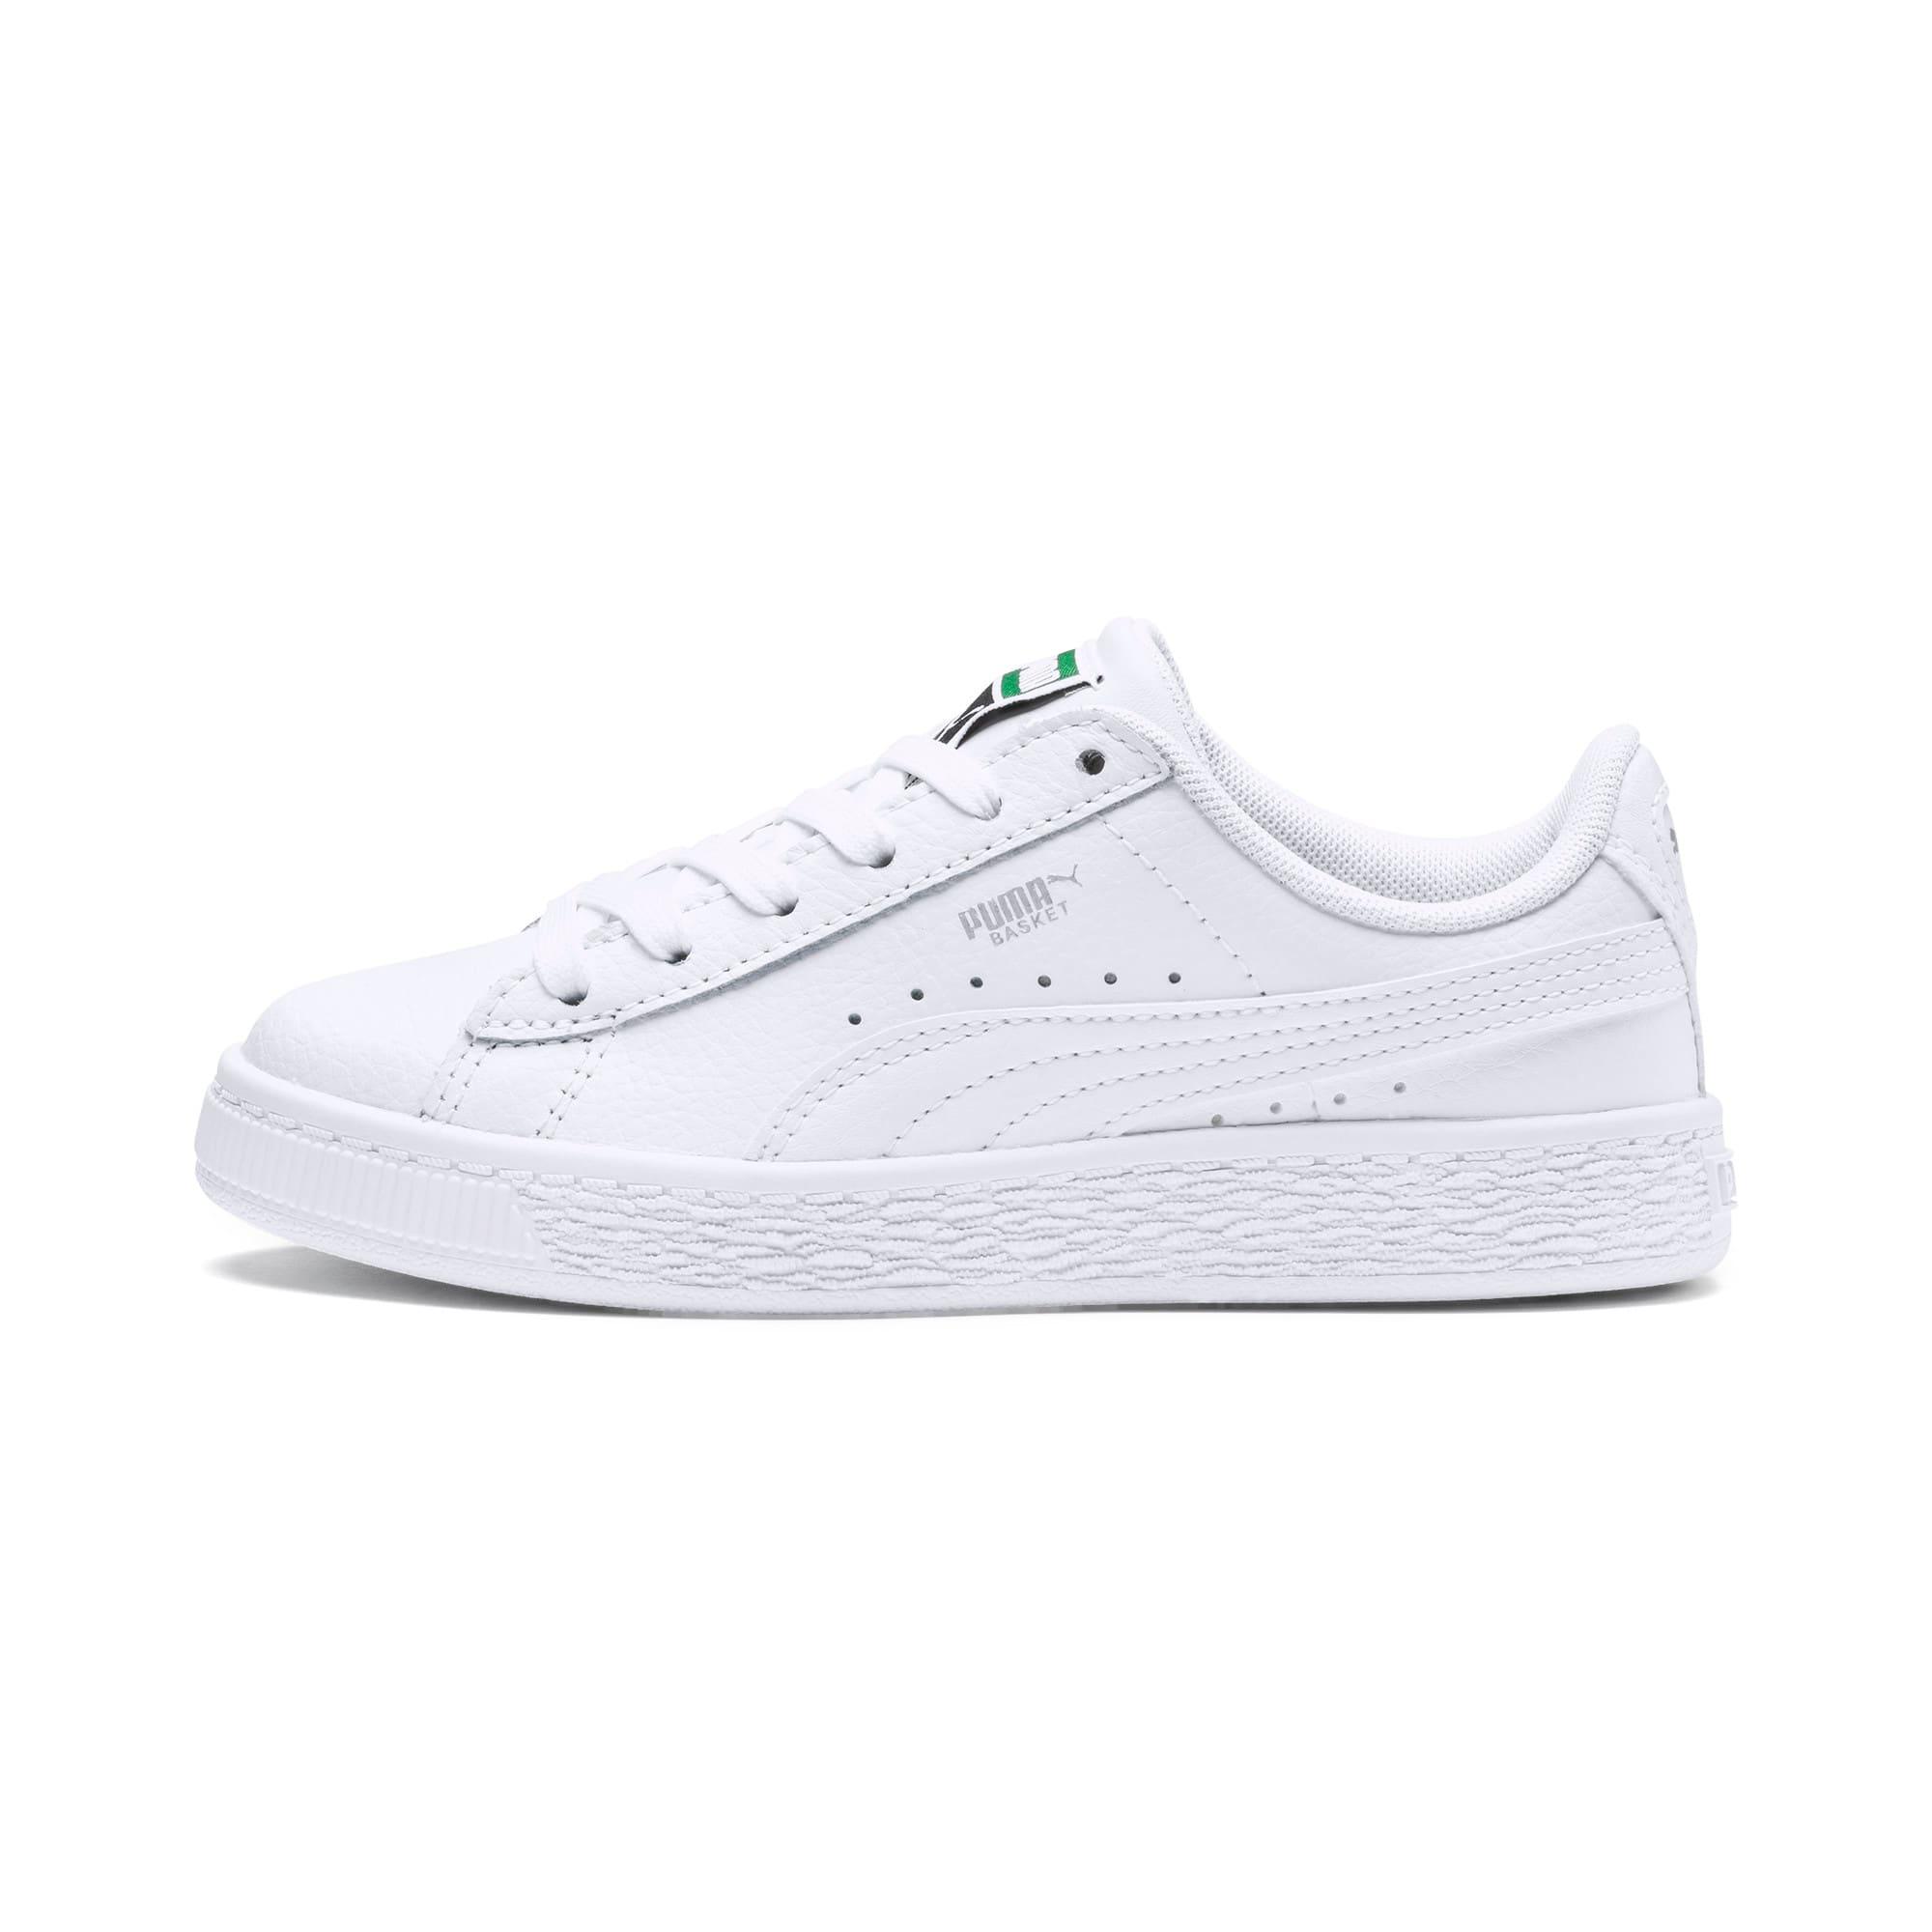 Thumbnail 1 of Basket Classic Kinder Sneaker, Puma White-Puma White, medium